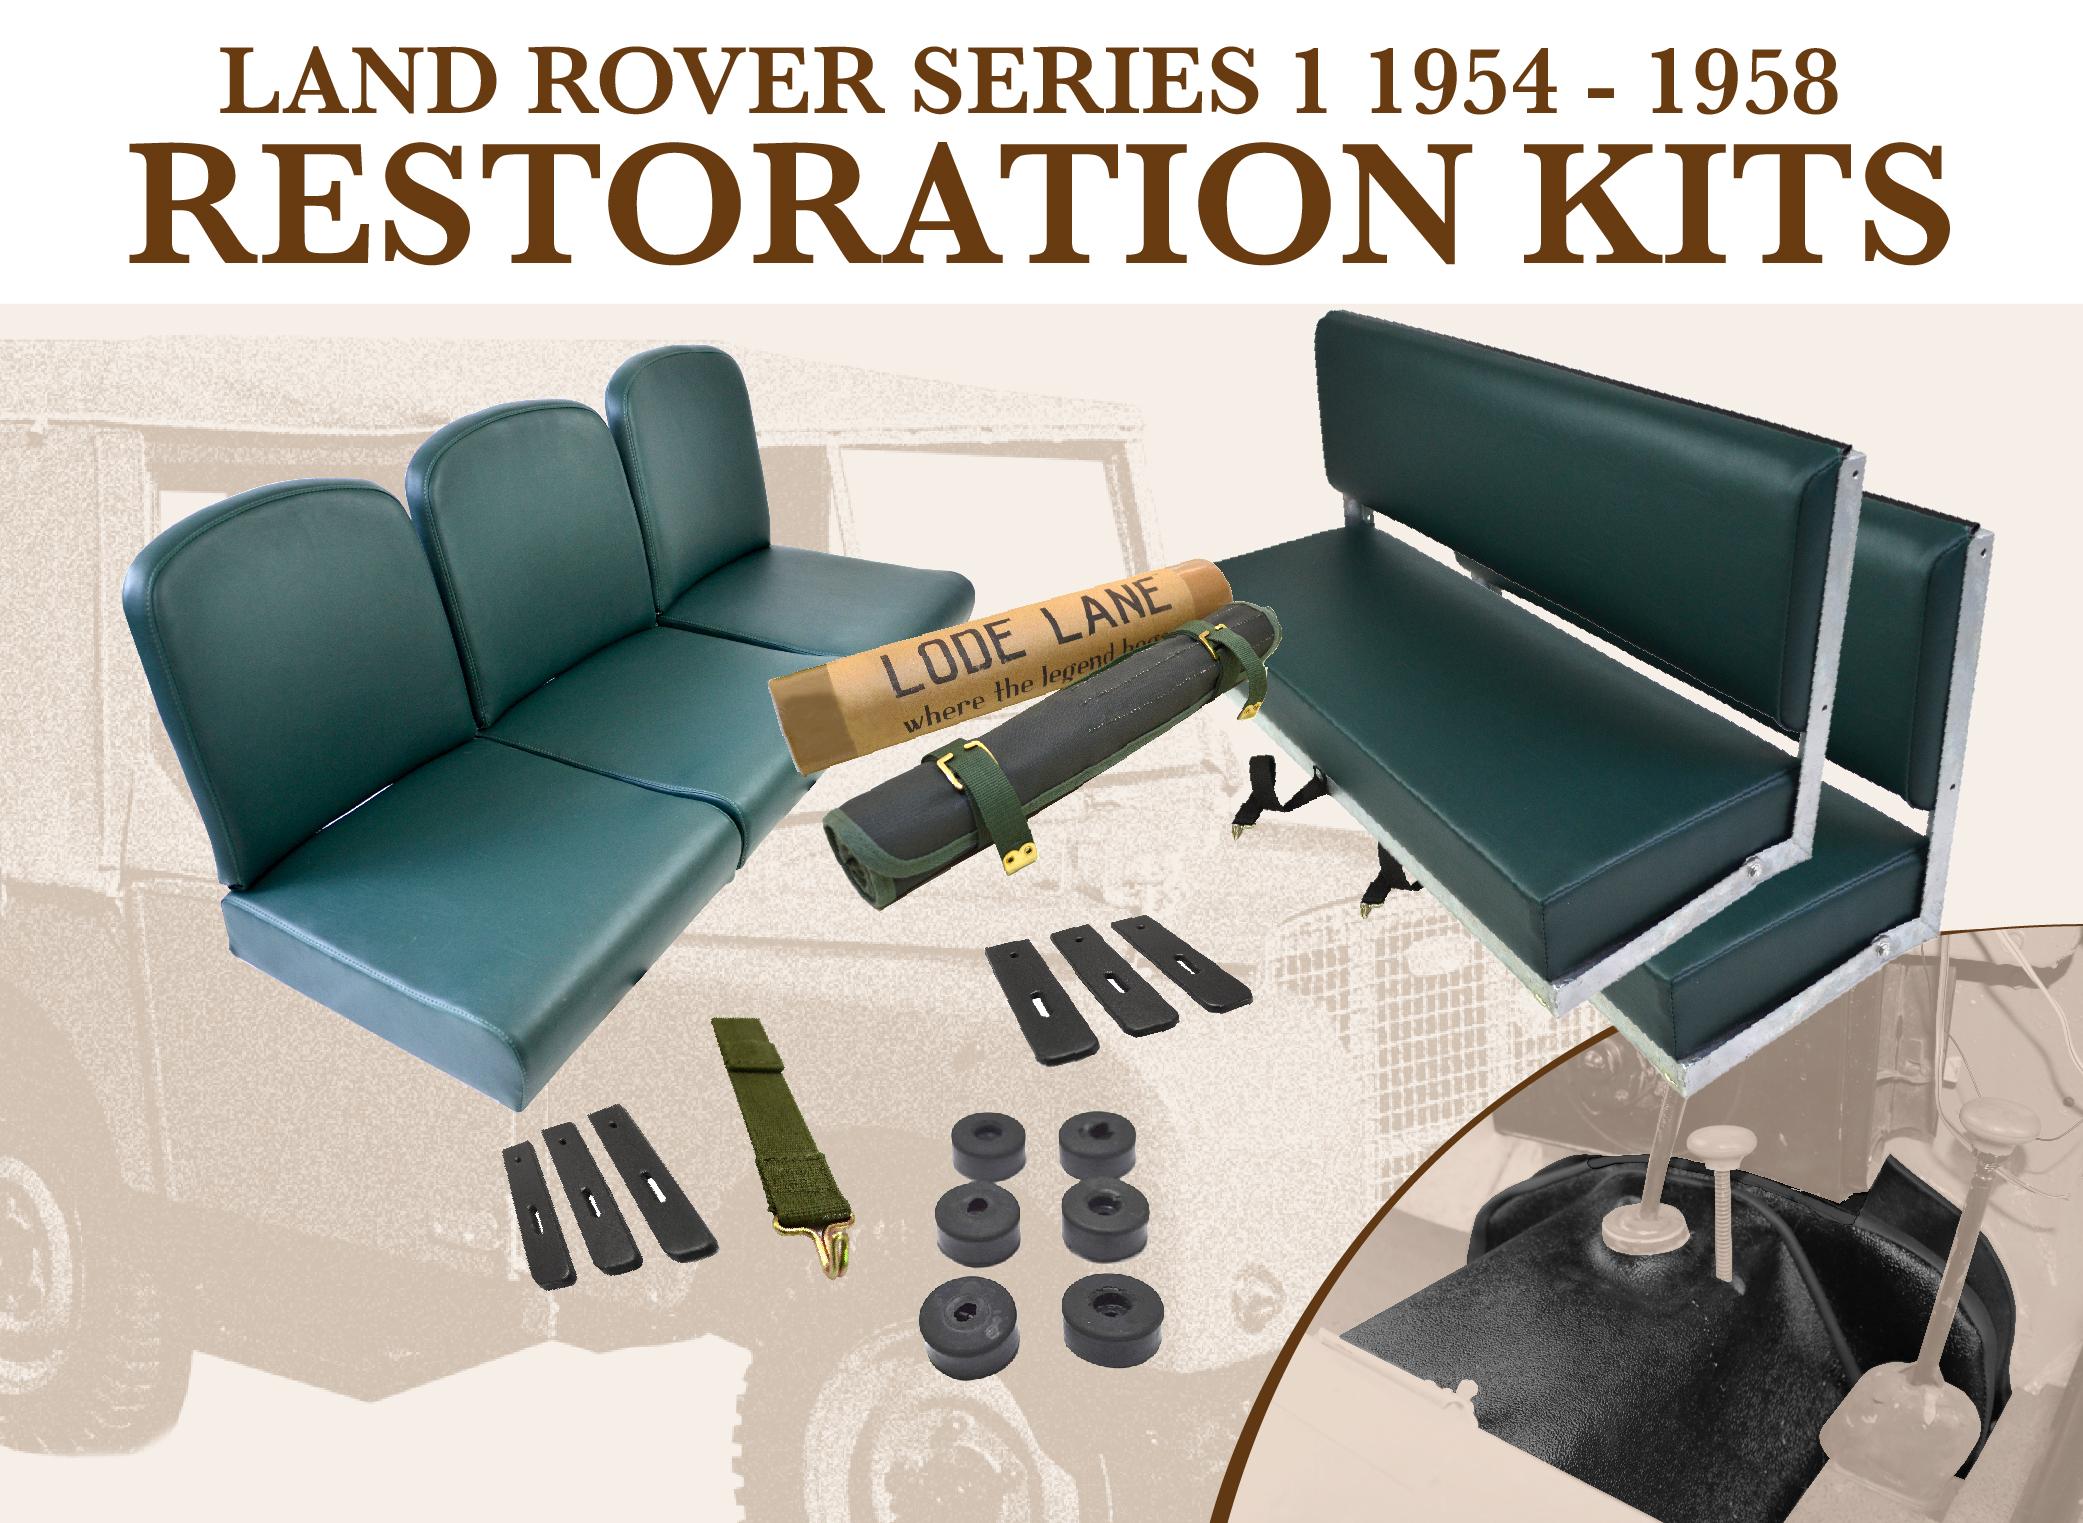 Restoration kits